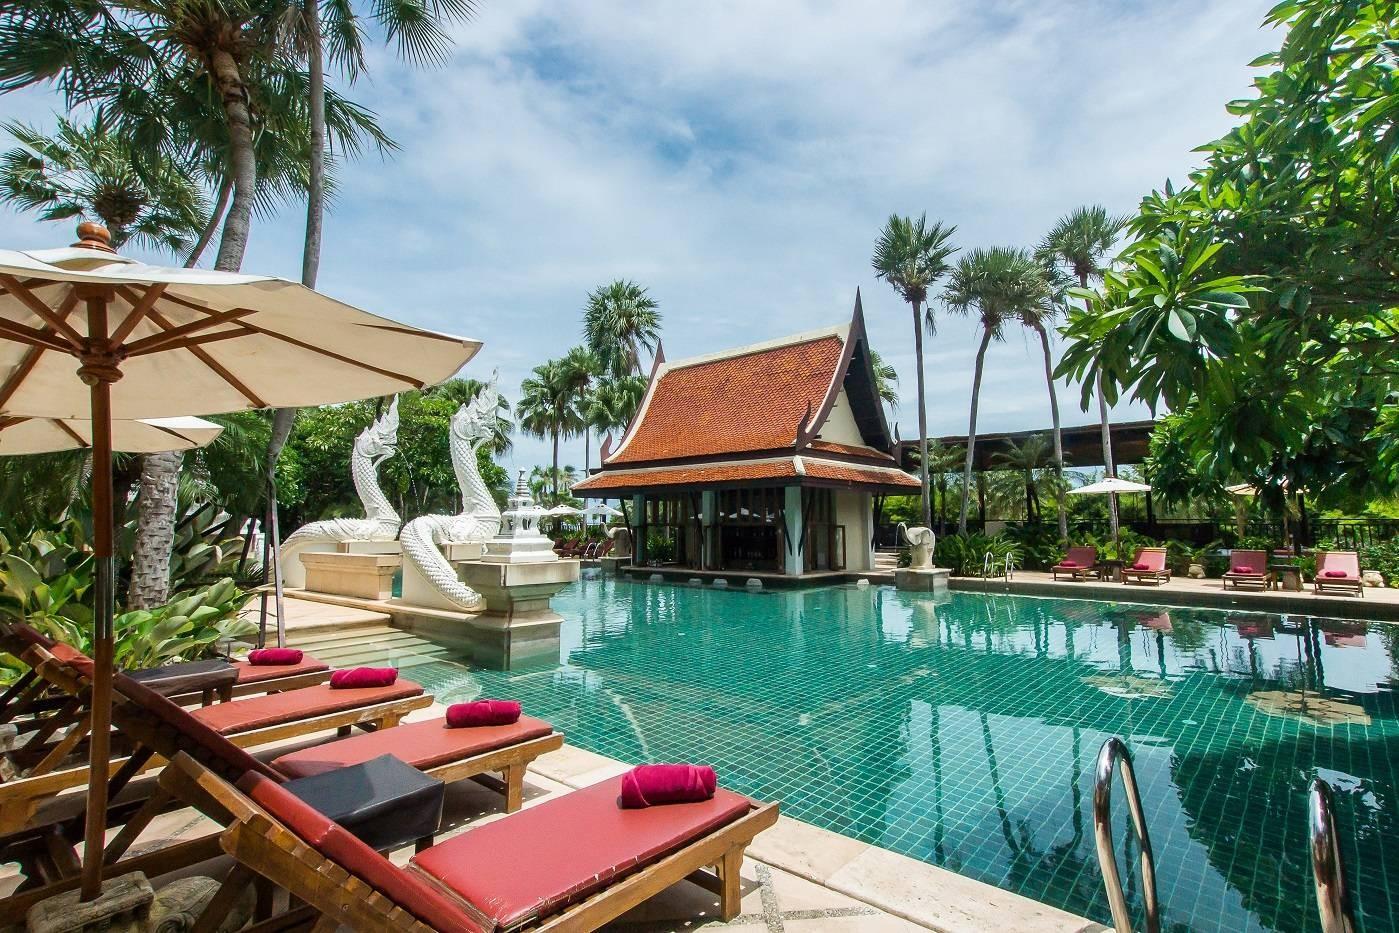 Dor Shada Swimming Pool